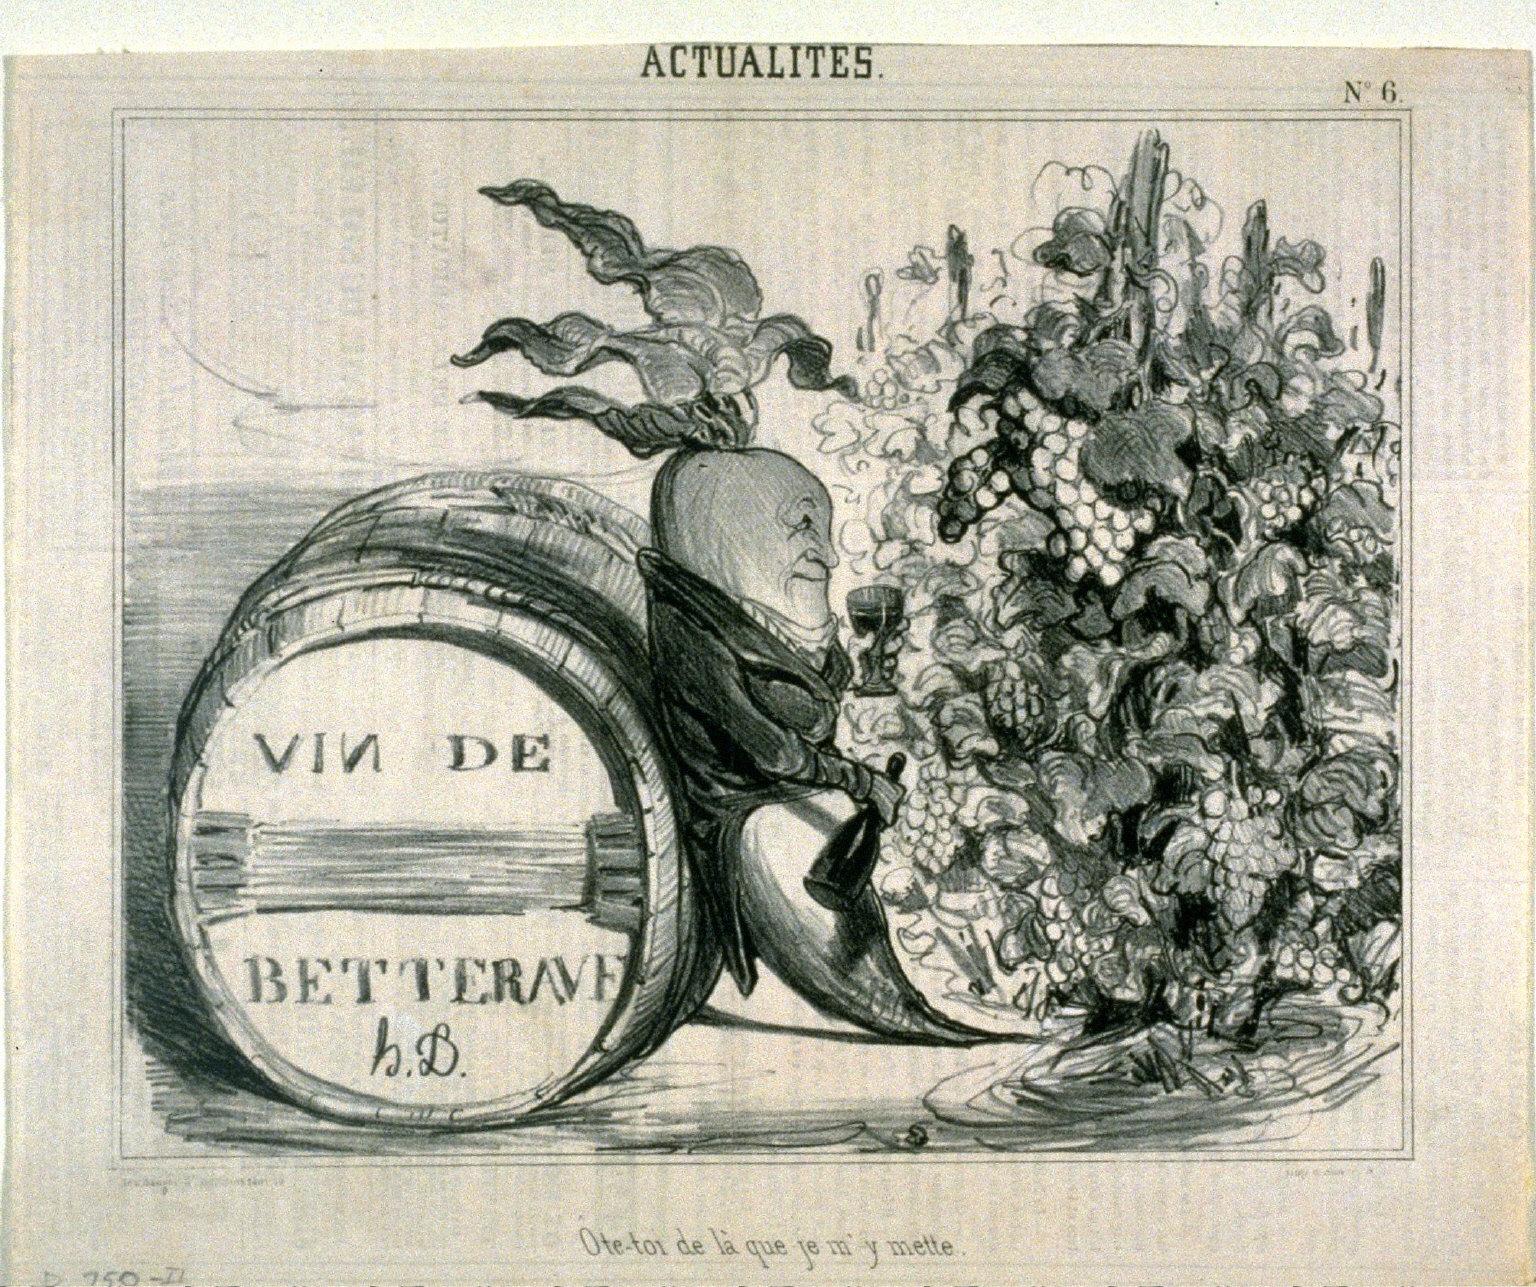 ?te-toi de là que je my mette.. no. 6 from the series ACTUALITÉS, published in Le Charivari 28 September 1839